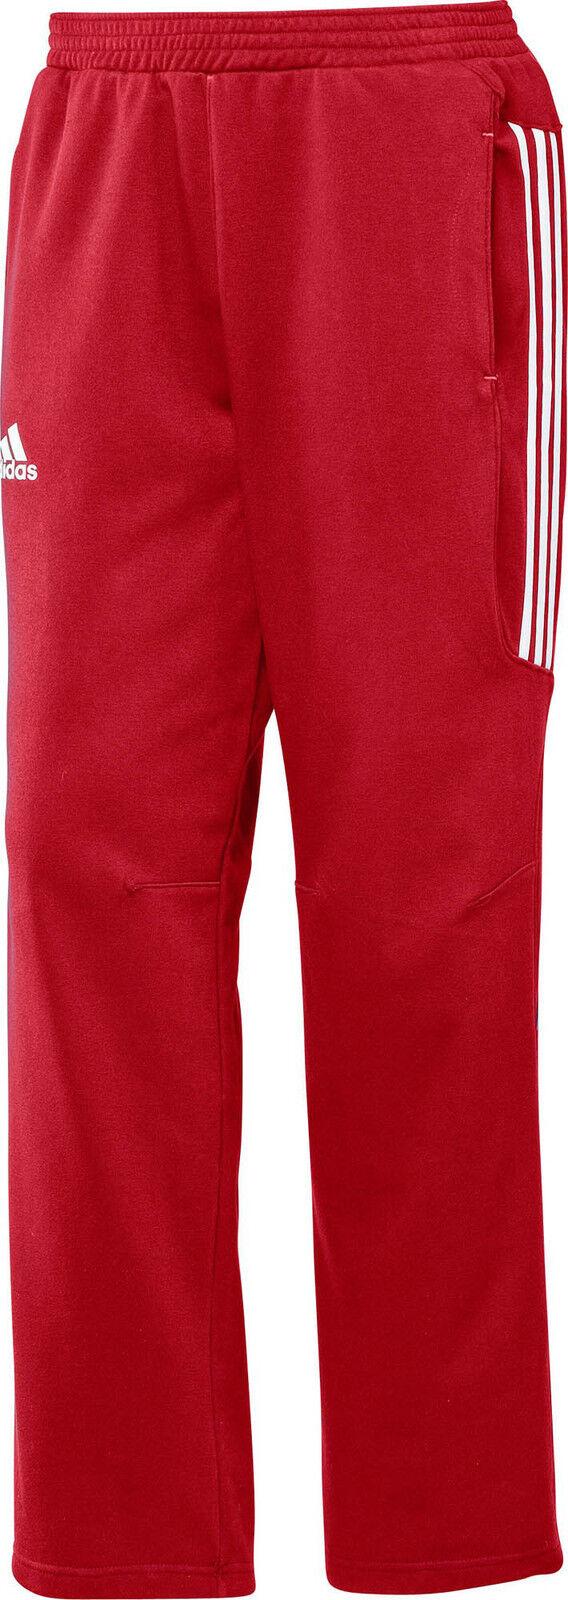 ABVERKAUF T12 Sweat Pant Männer red X12912, Team Hose, Sporthose, Jogging-Hose